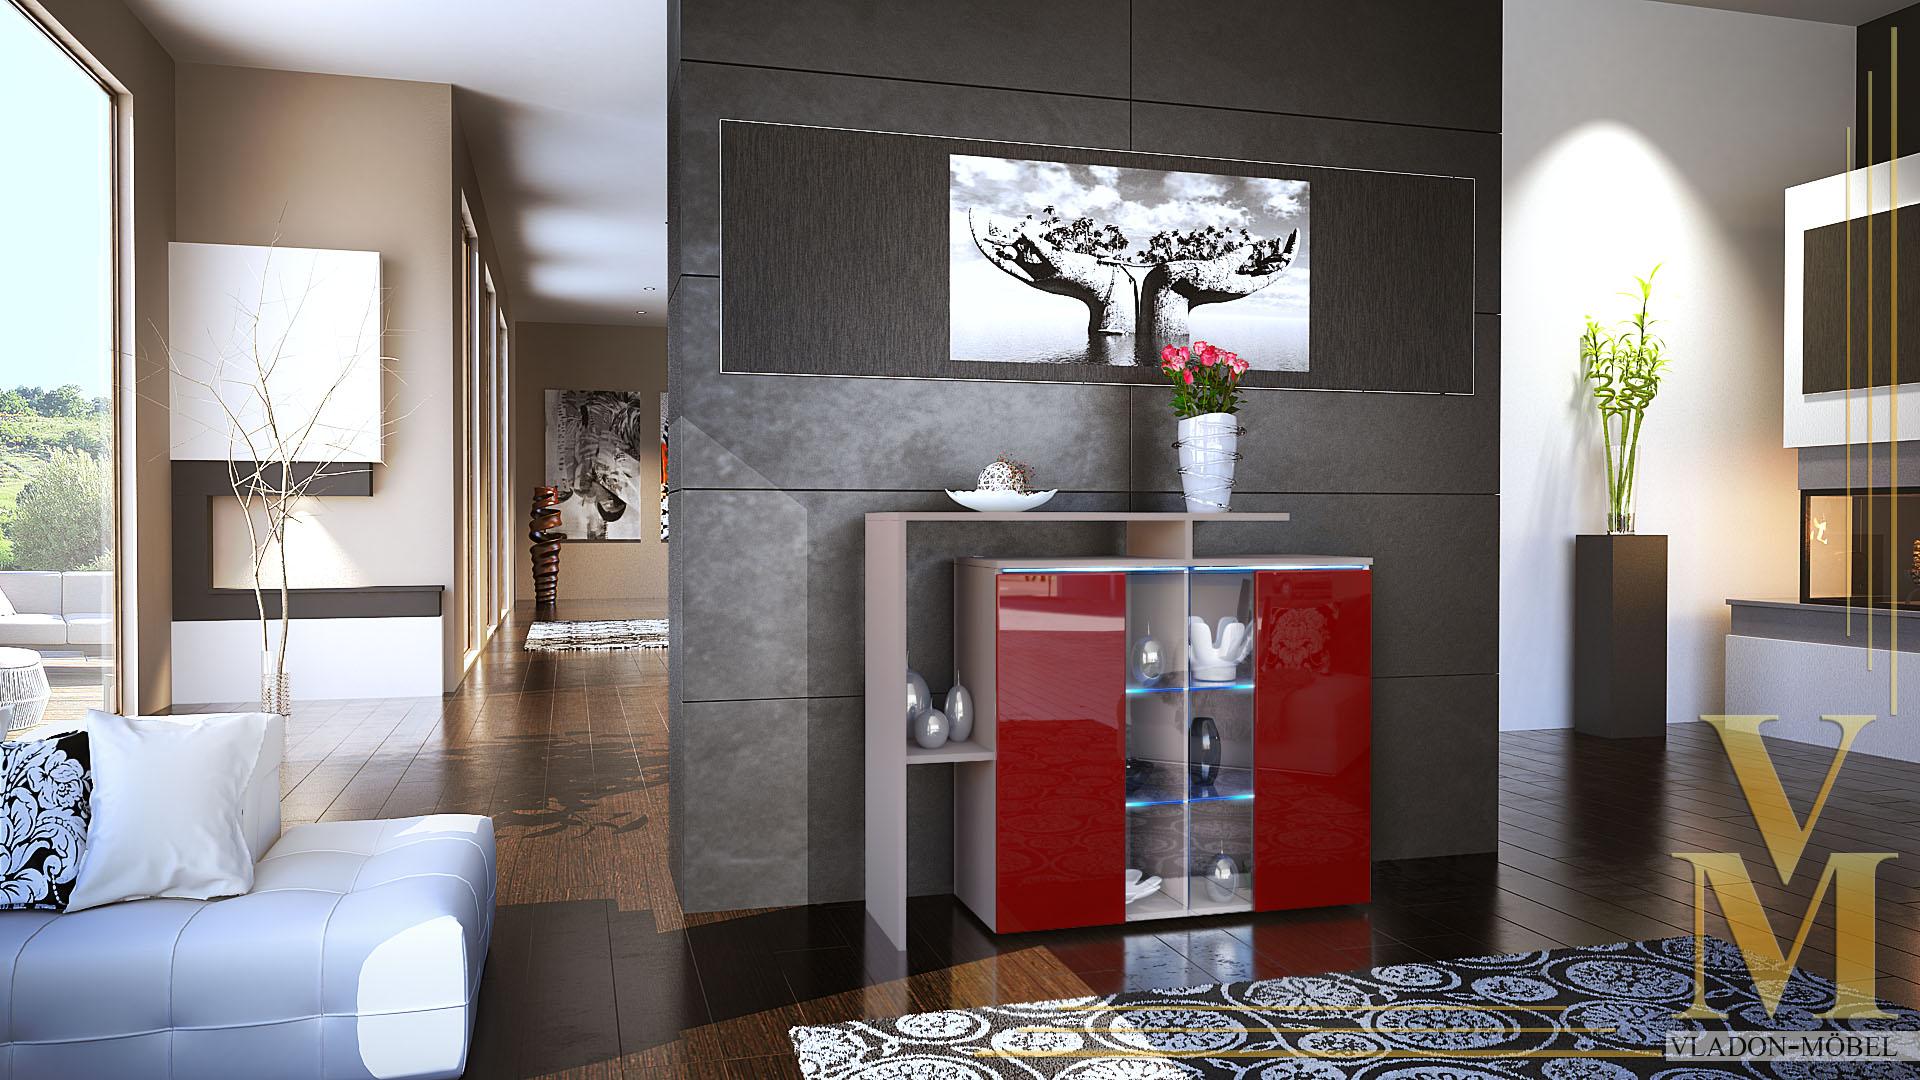 Farbgestaltung wohnzimmer cappuccino – dumss.com